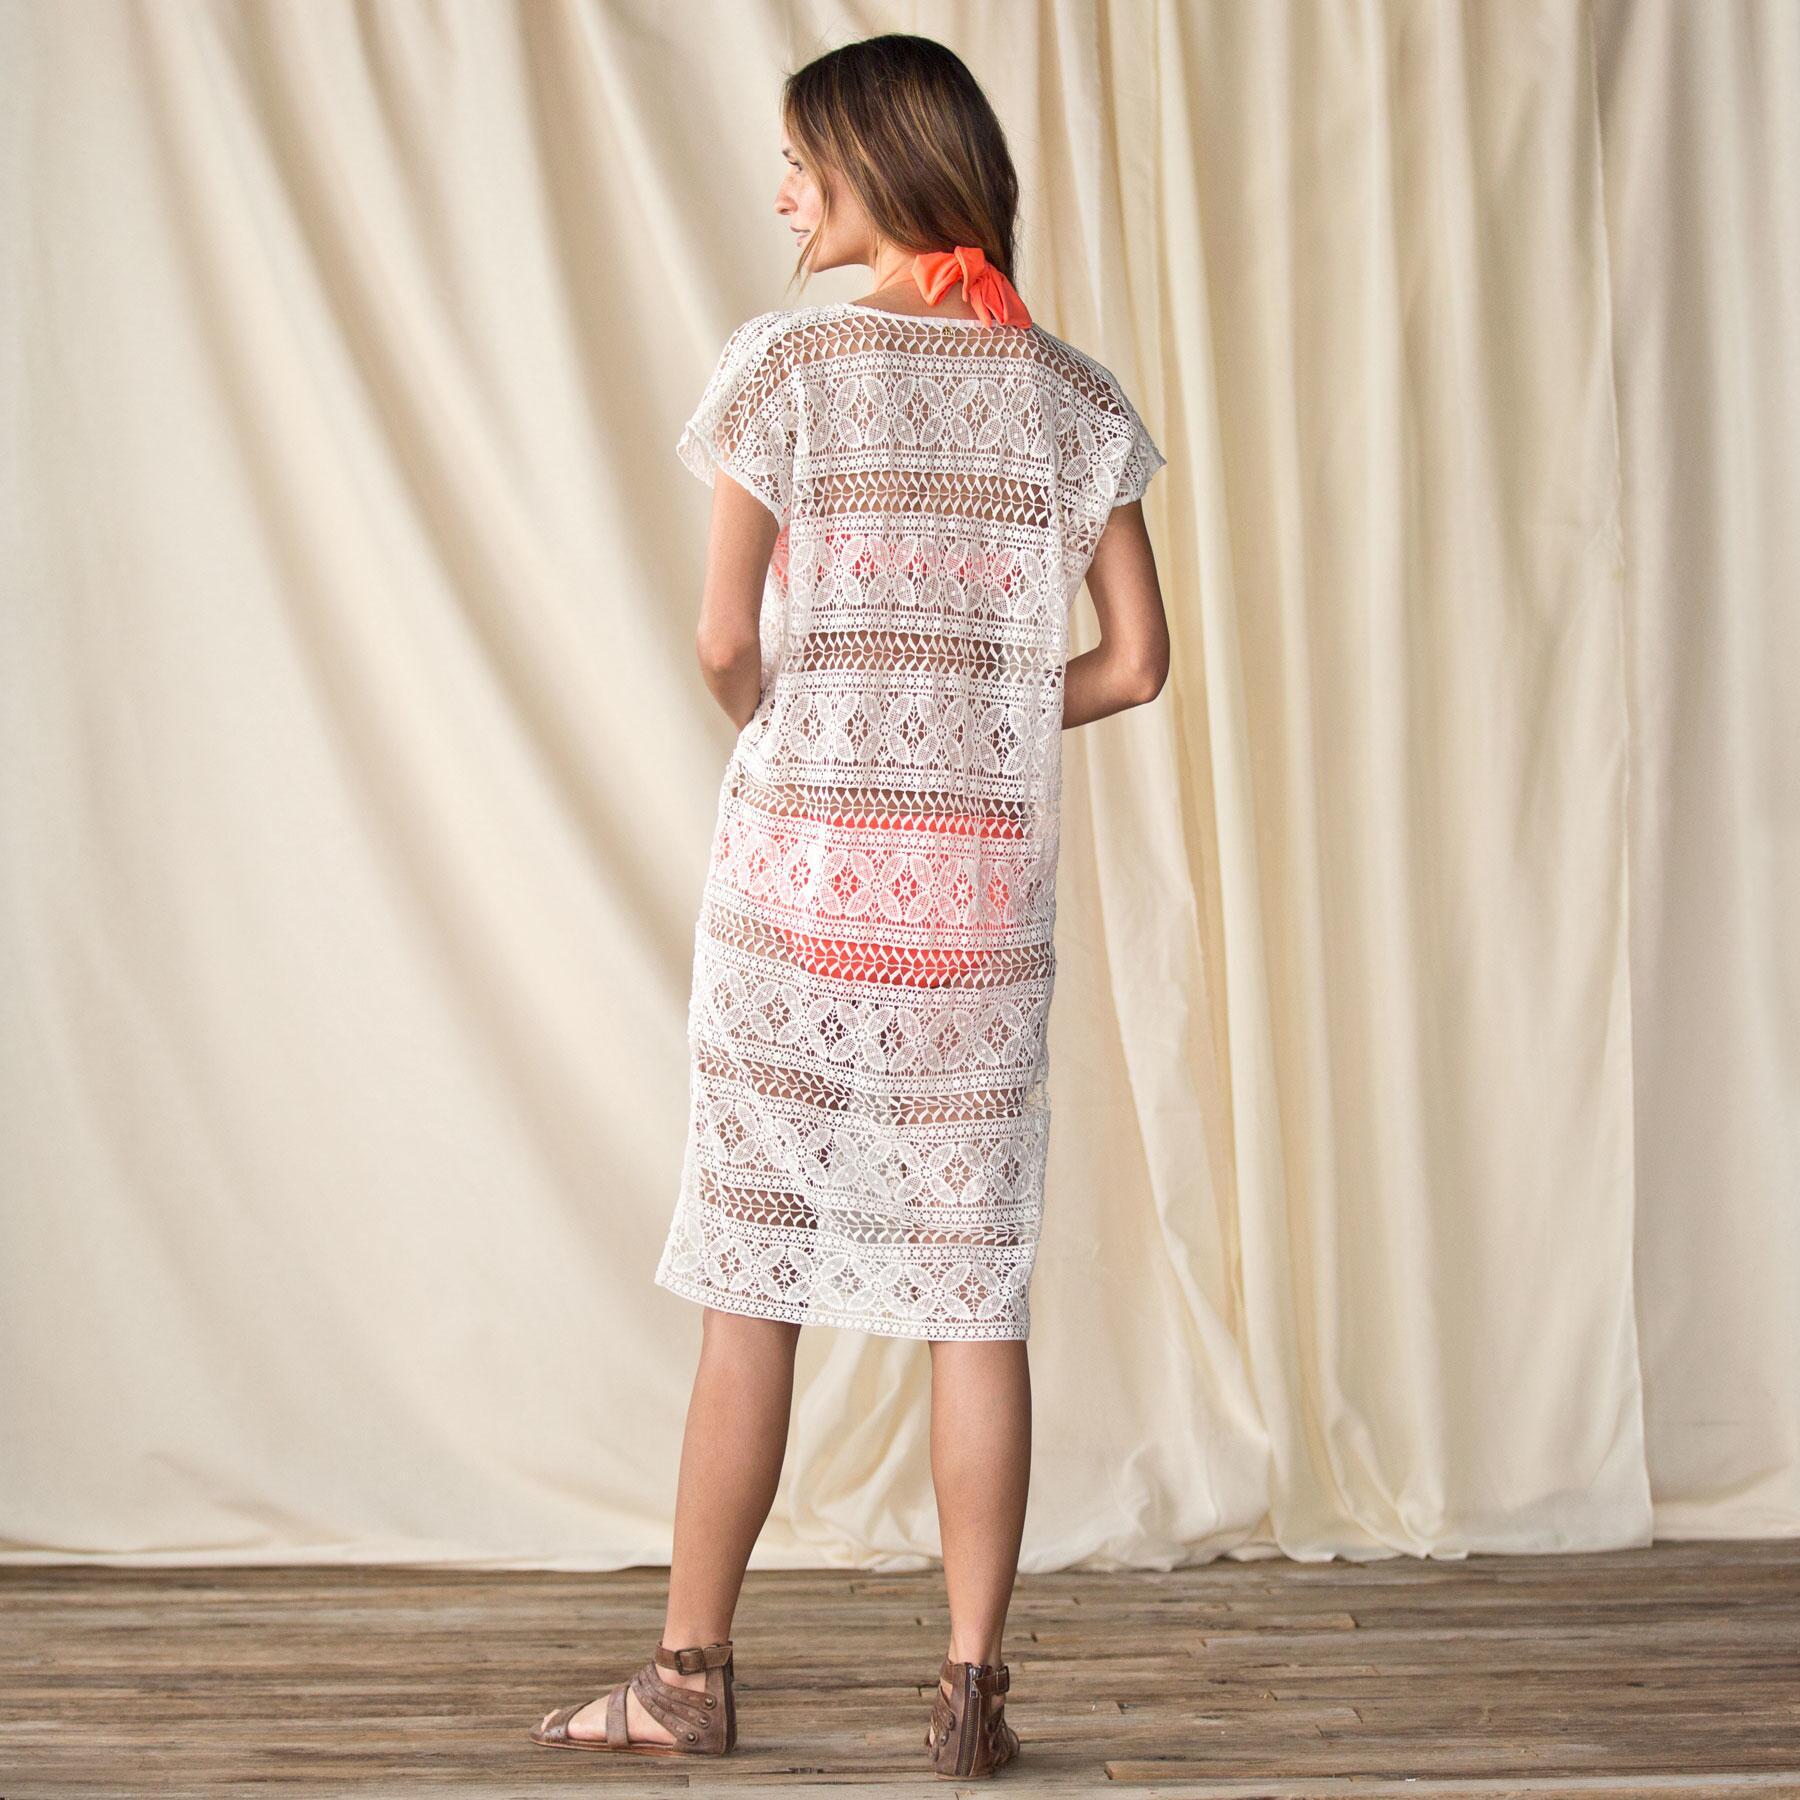 CROCHET DRESS-THE DESERT: View 2